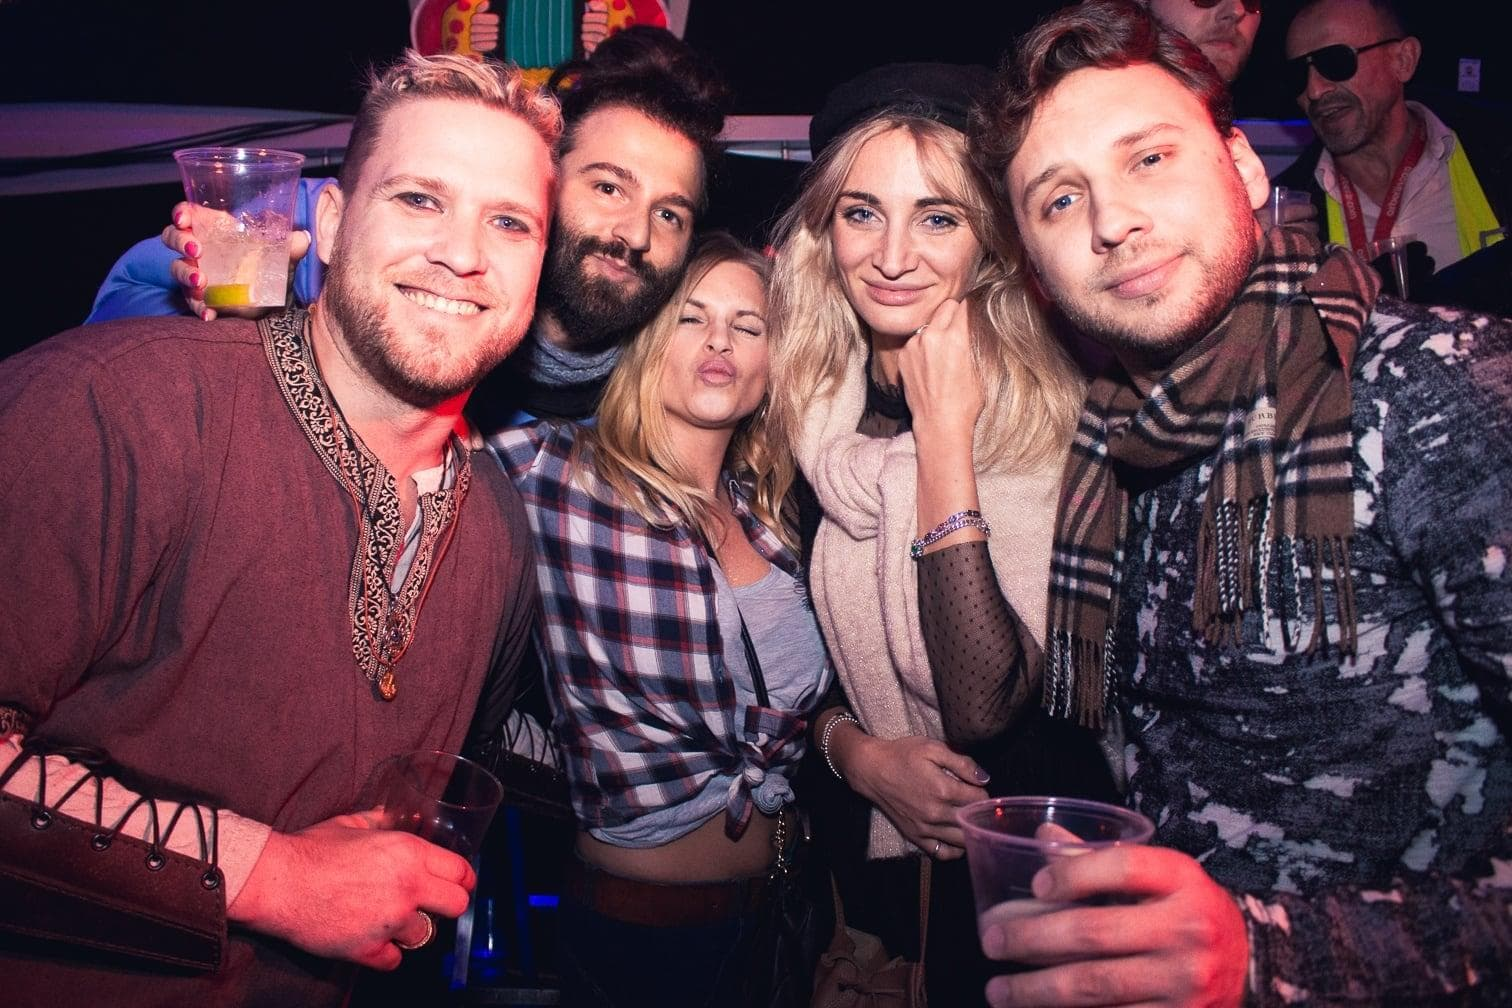 Foto: TONIGHT.de